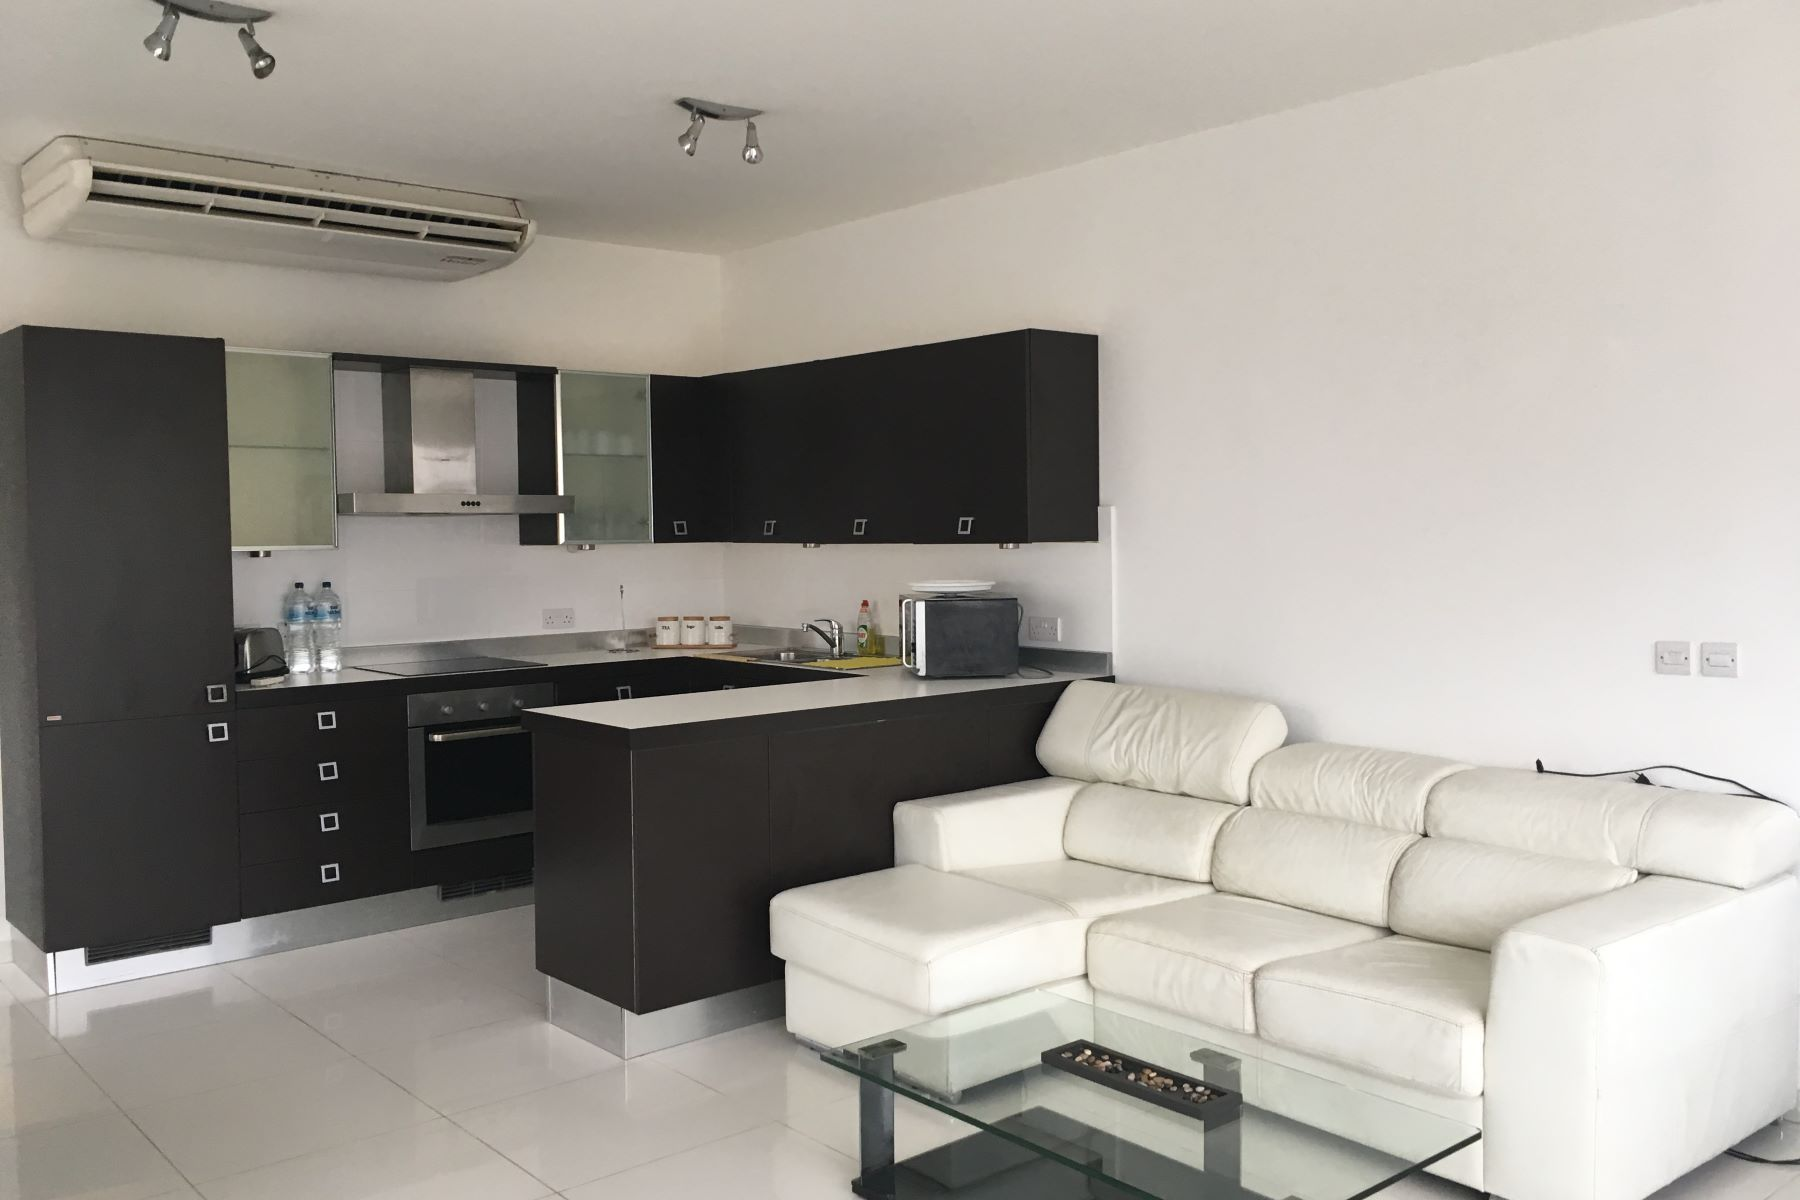 شقة للـ Rent في Spacious Two Bedroom Penthouse Madliena, Malta